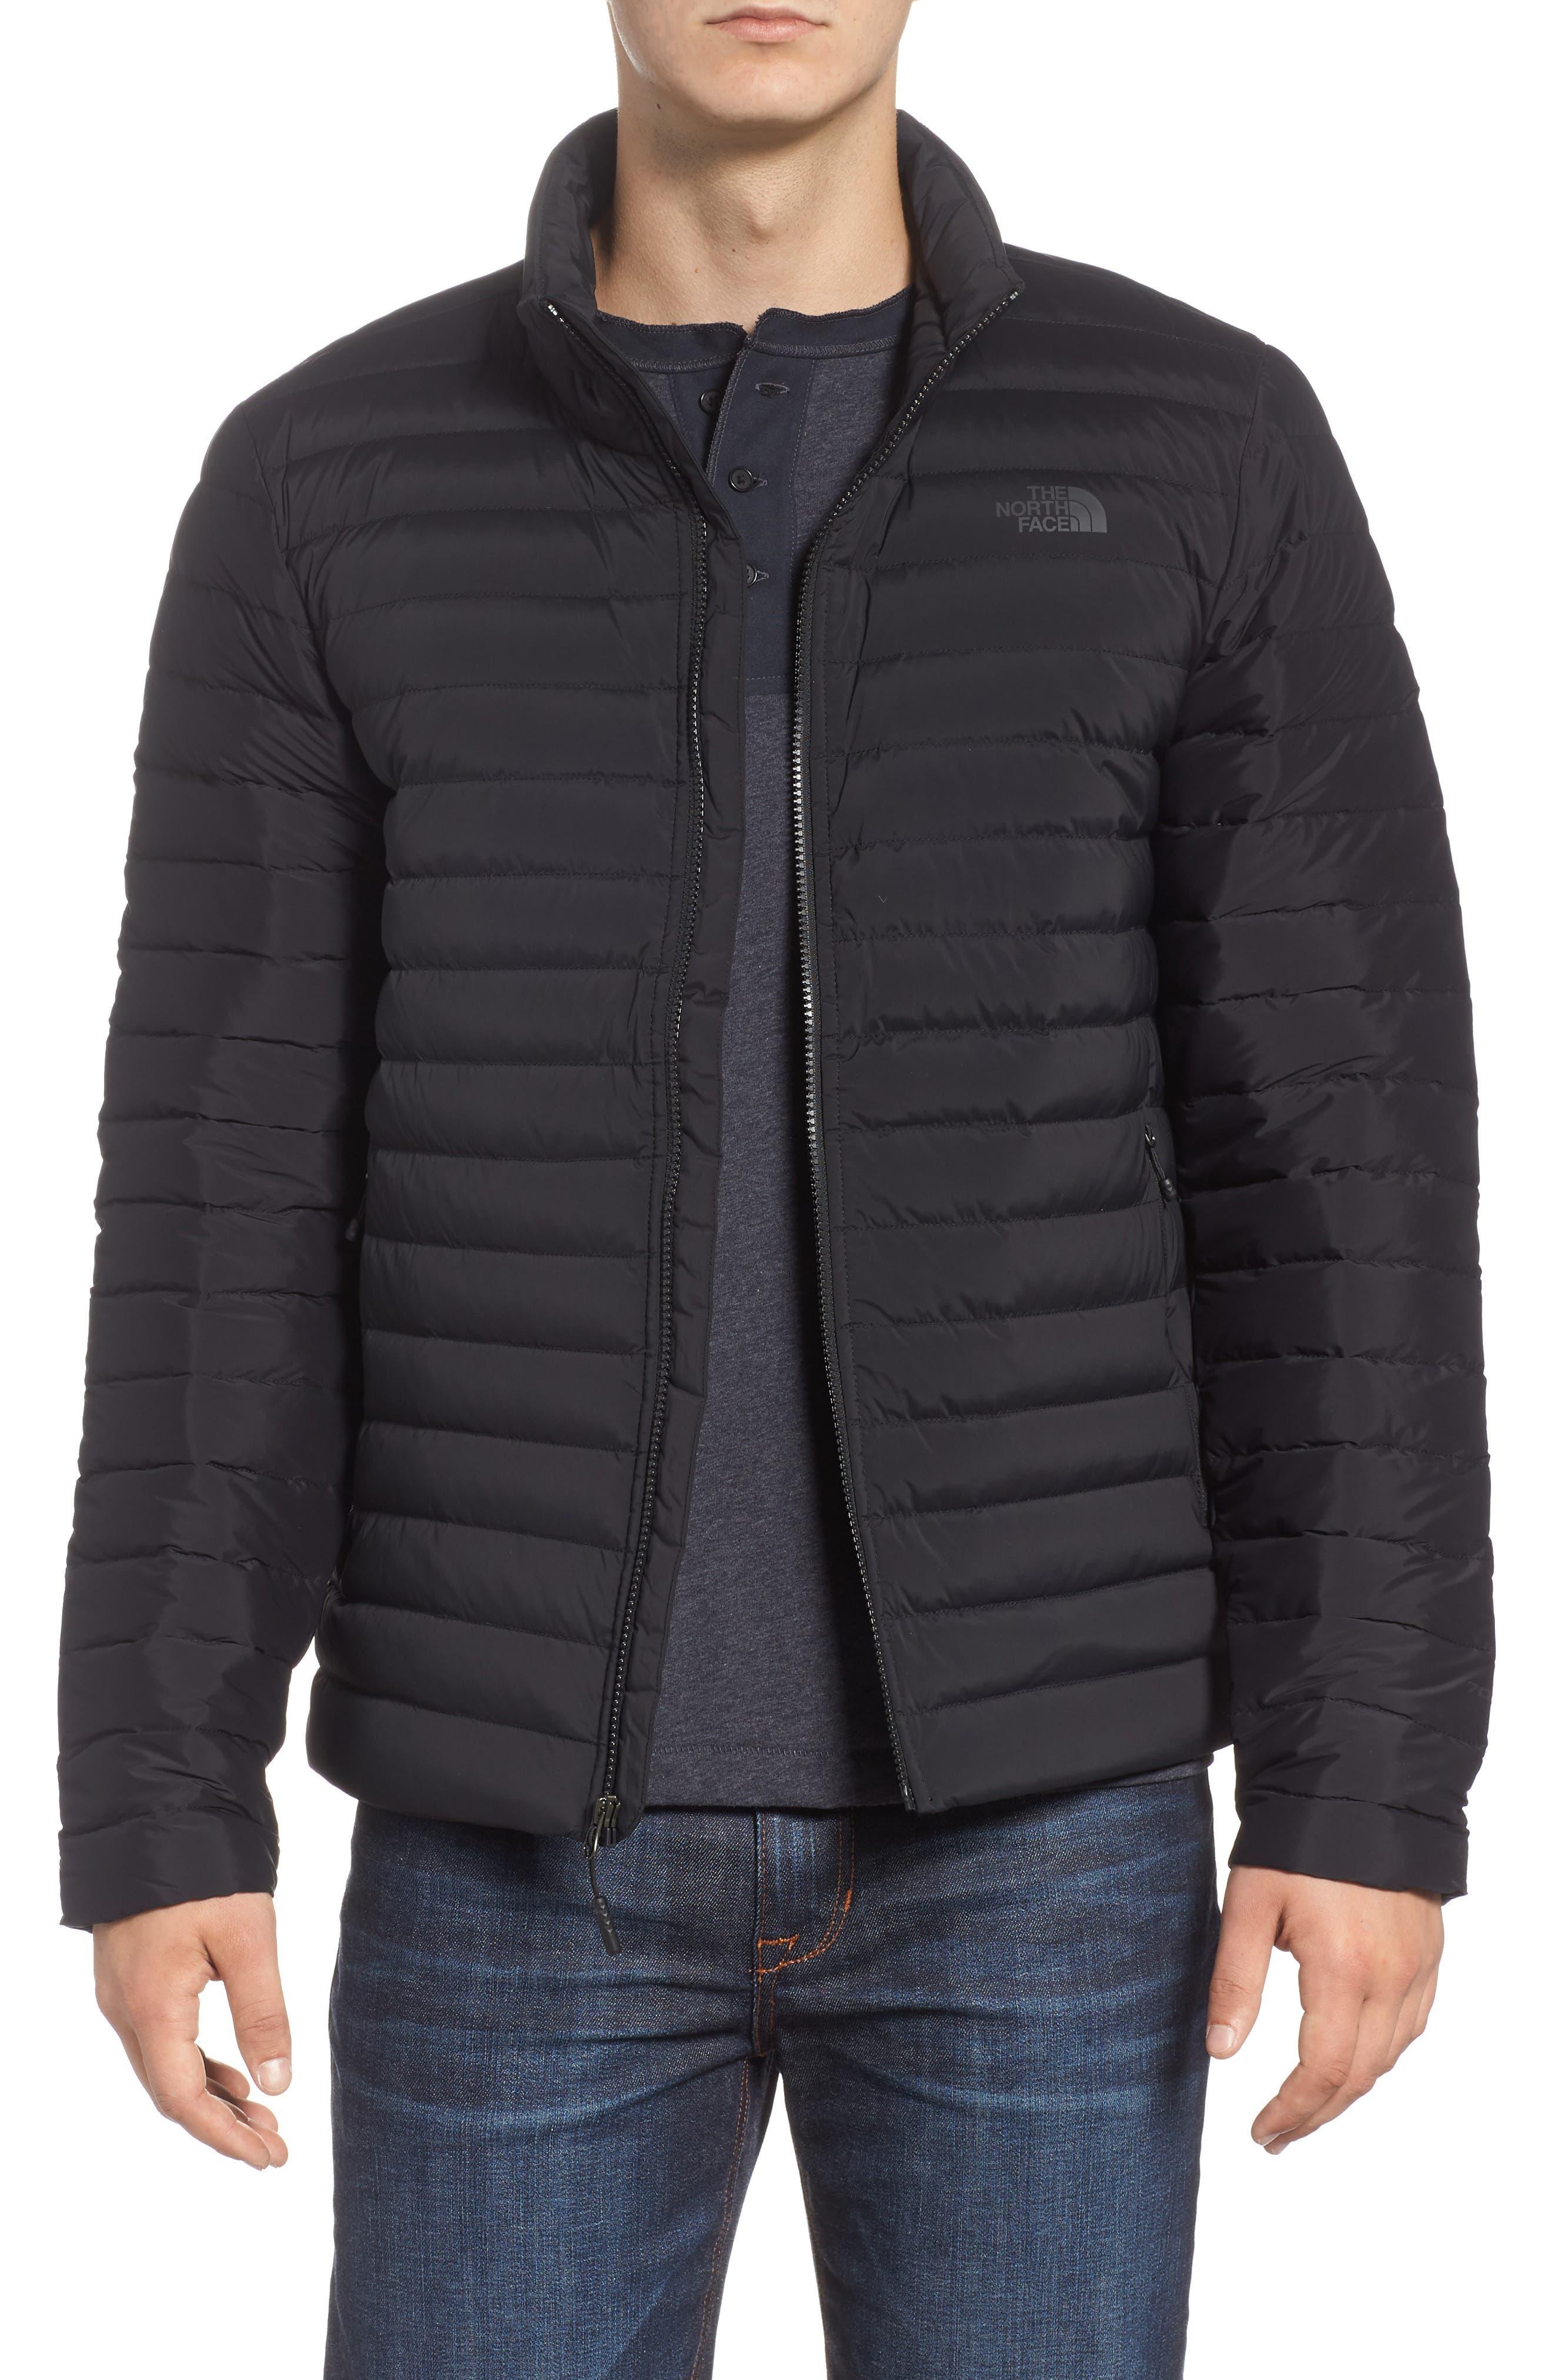 Packable Stretch Down Jacket,                             Main thumbnail 1, color,                             TNF BLACK/ TNF BLACK